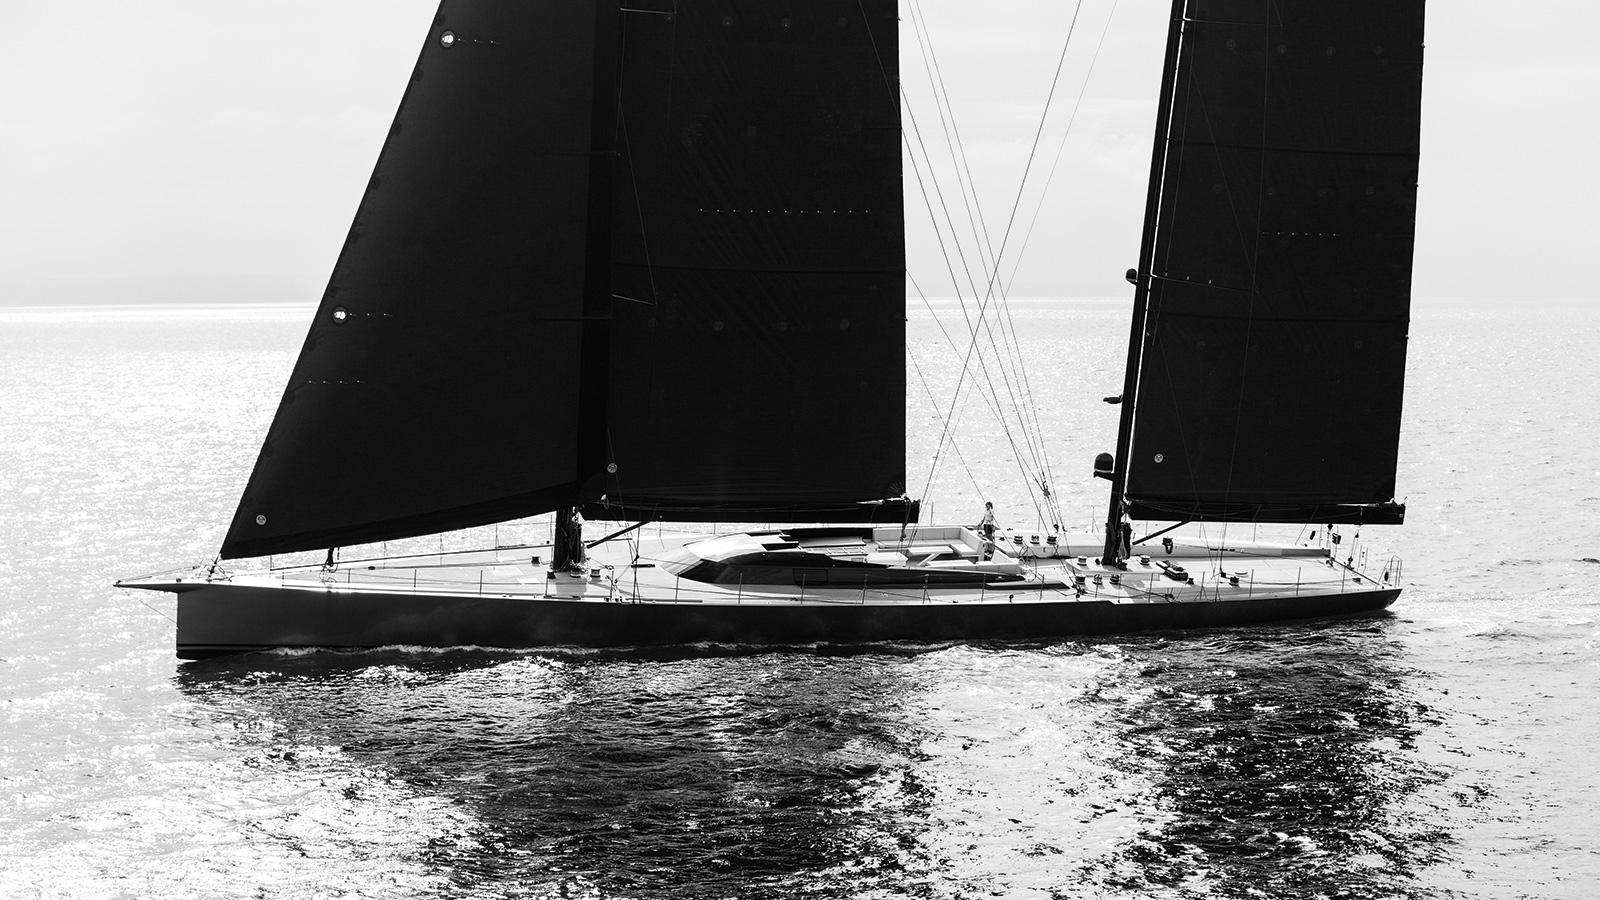 portside-view-of-refitted-sailing-super-yacht-samurai